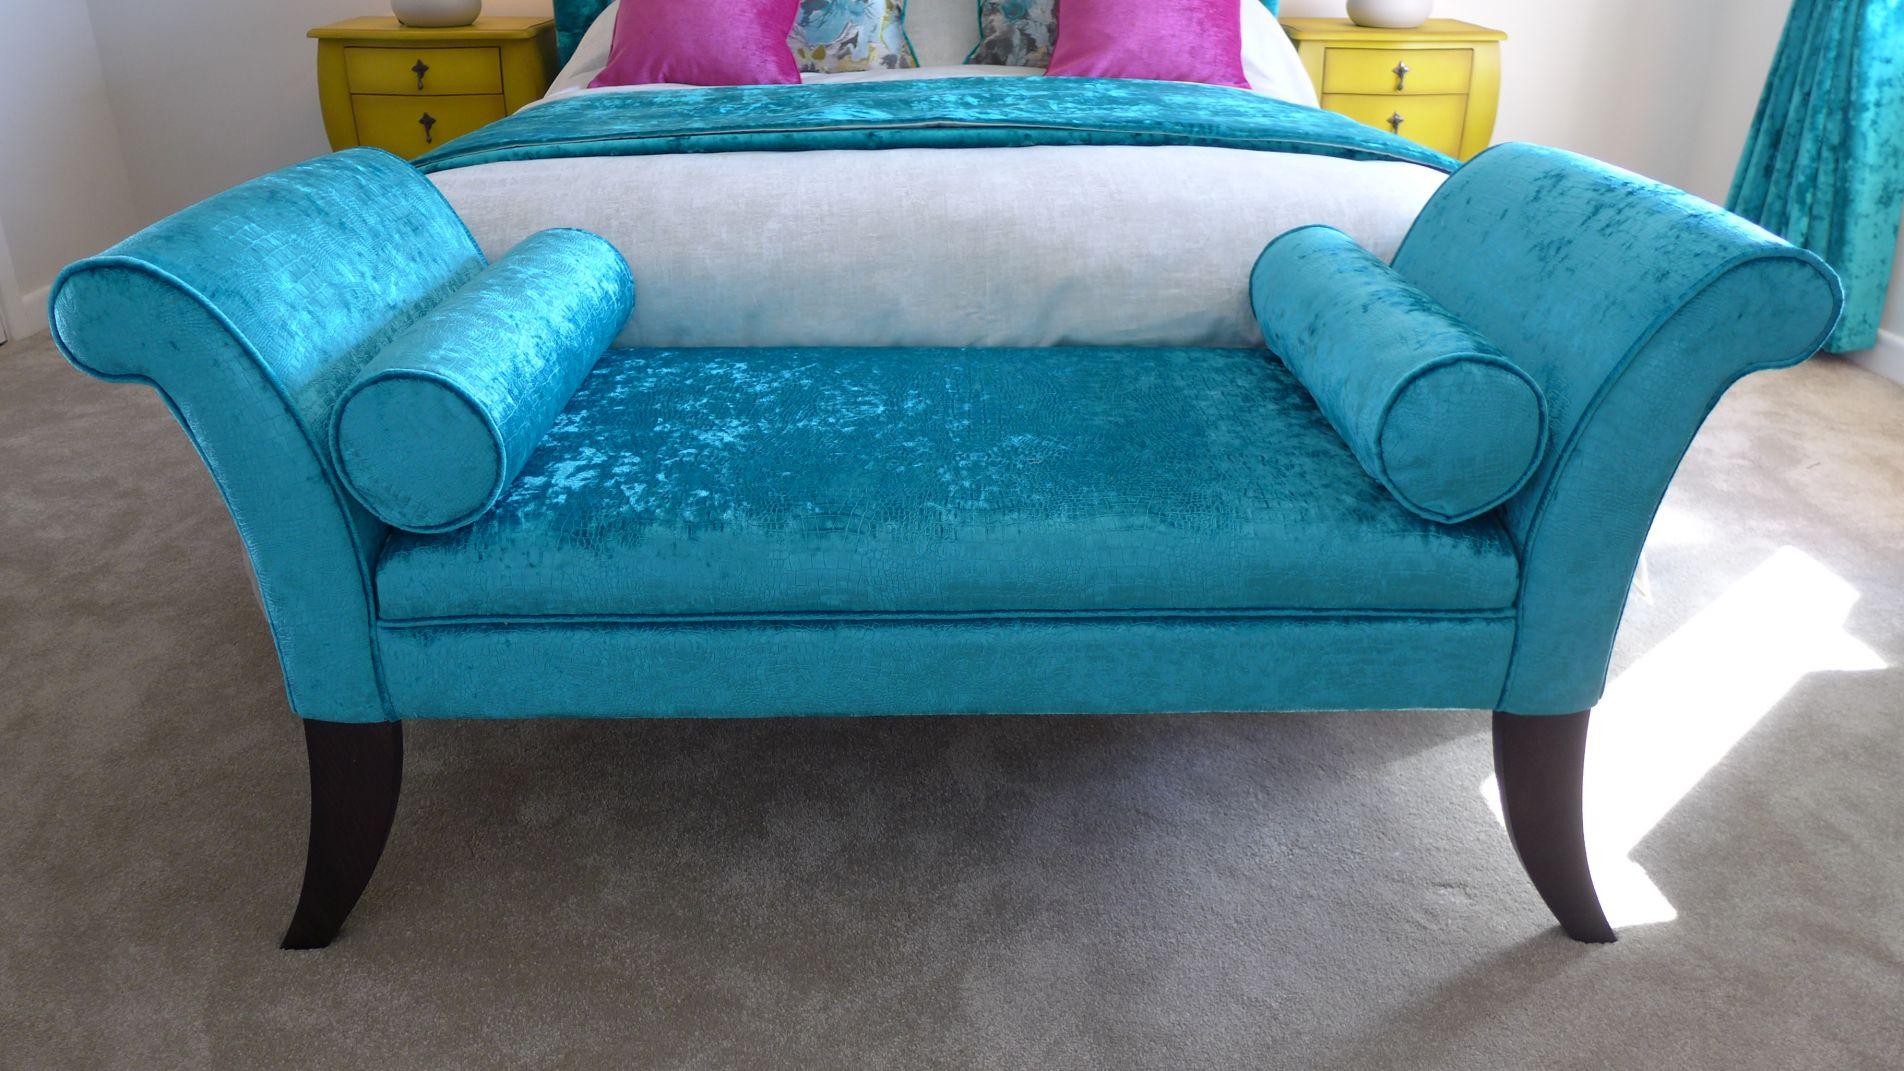 Style Within - interior design in Bath